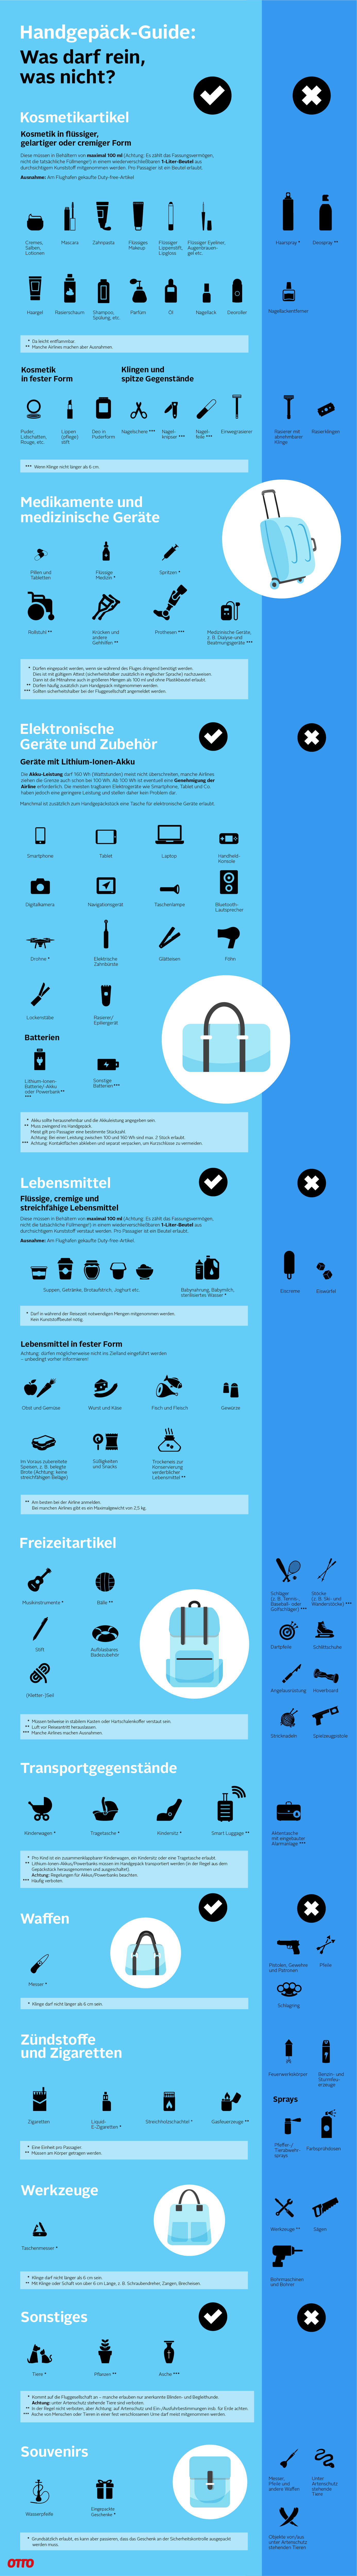 Ottoversand Infografik: Was darf ins Handgepäck?